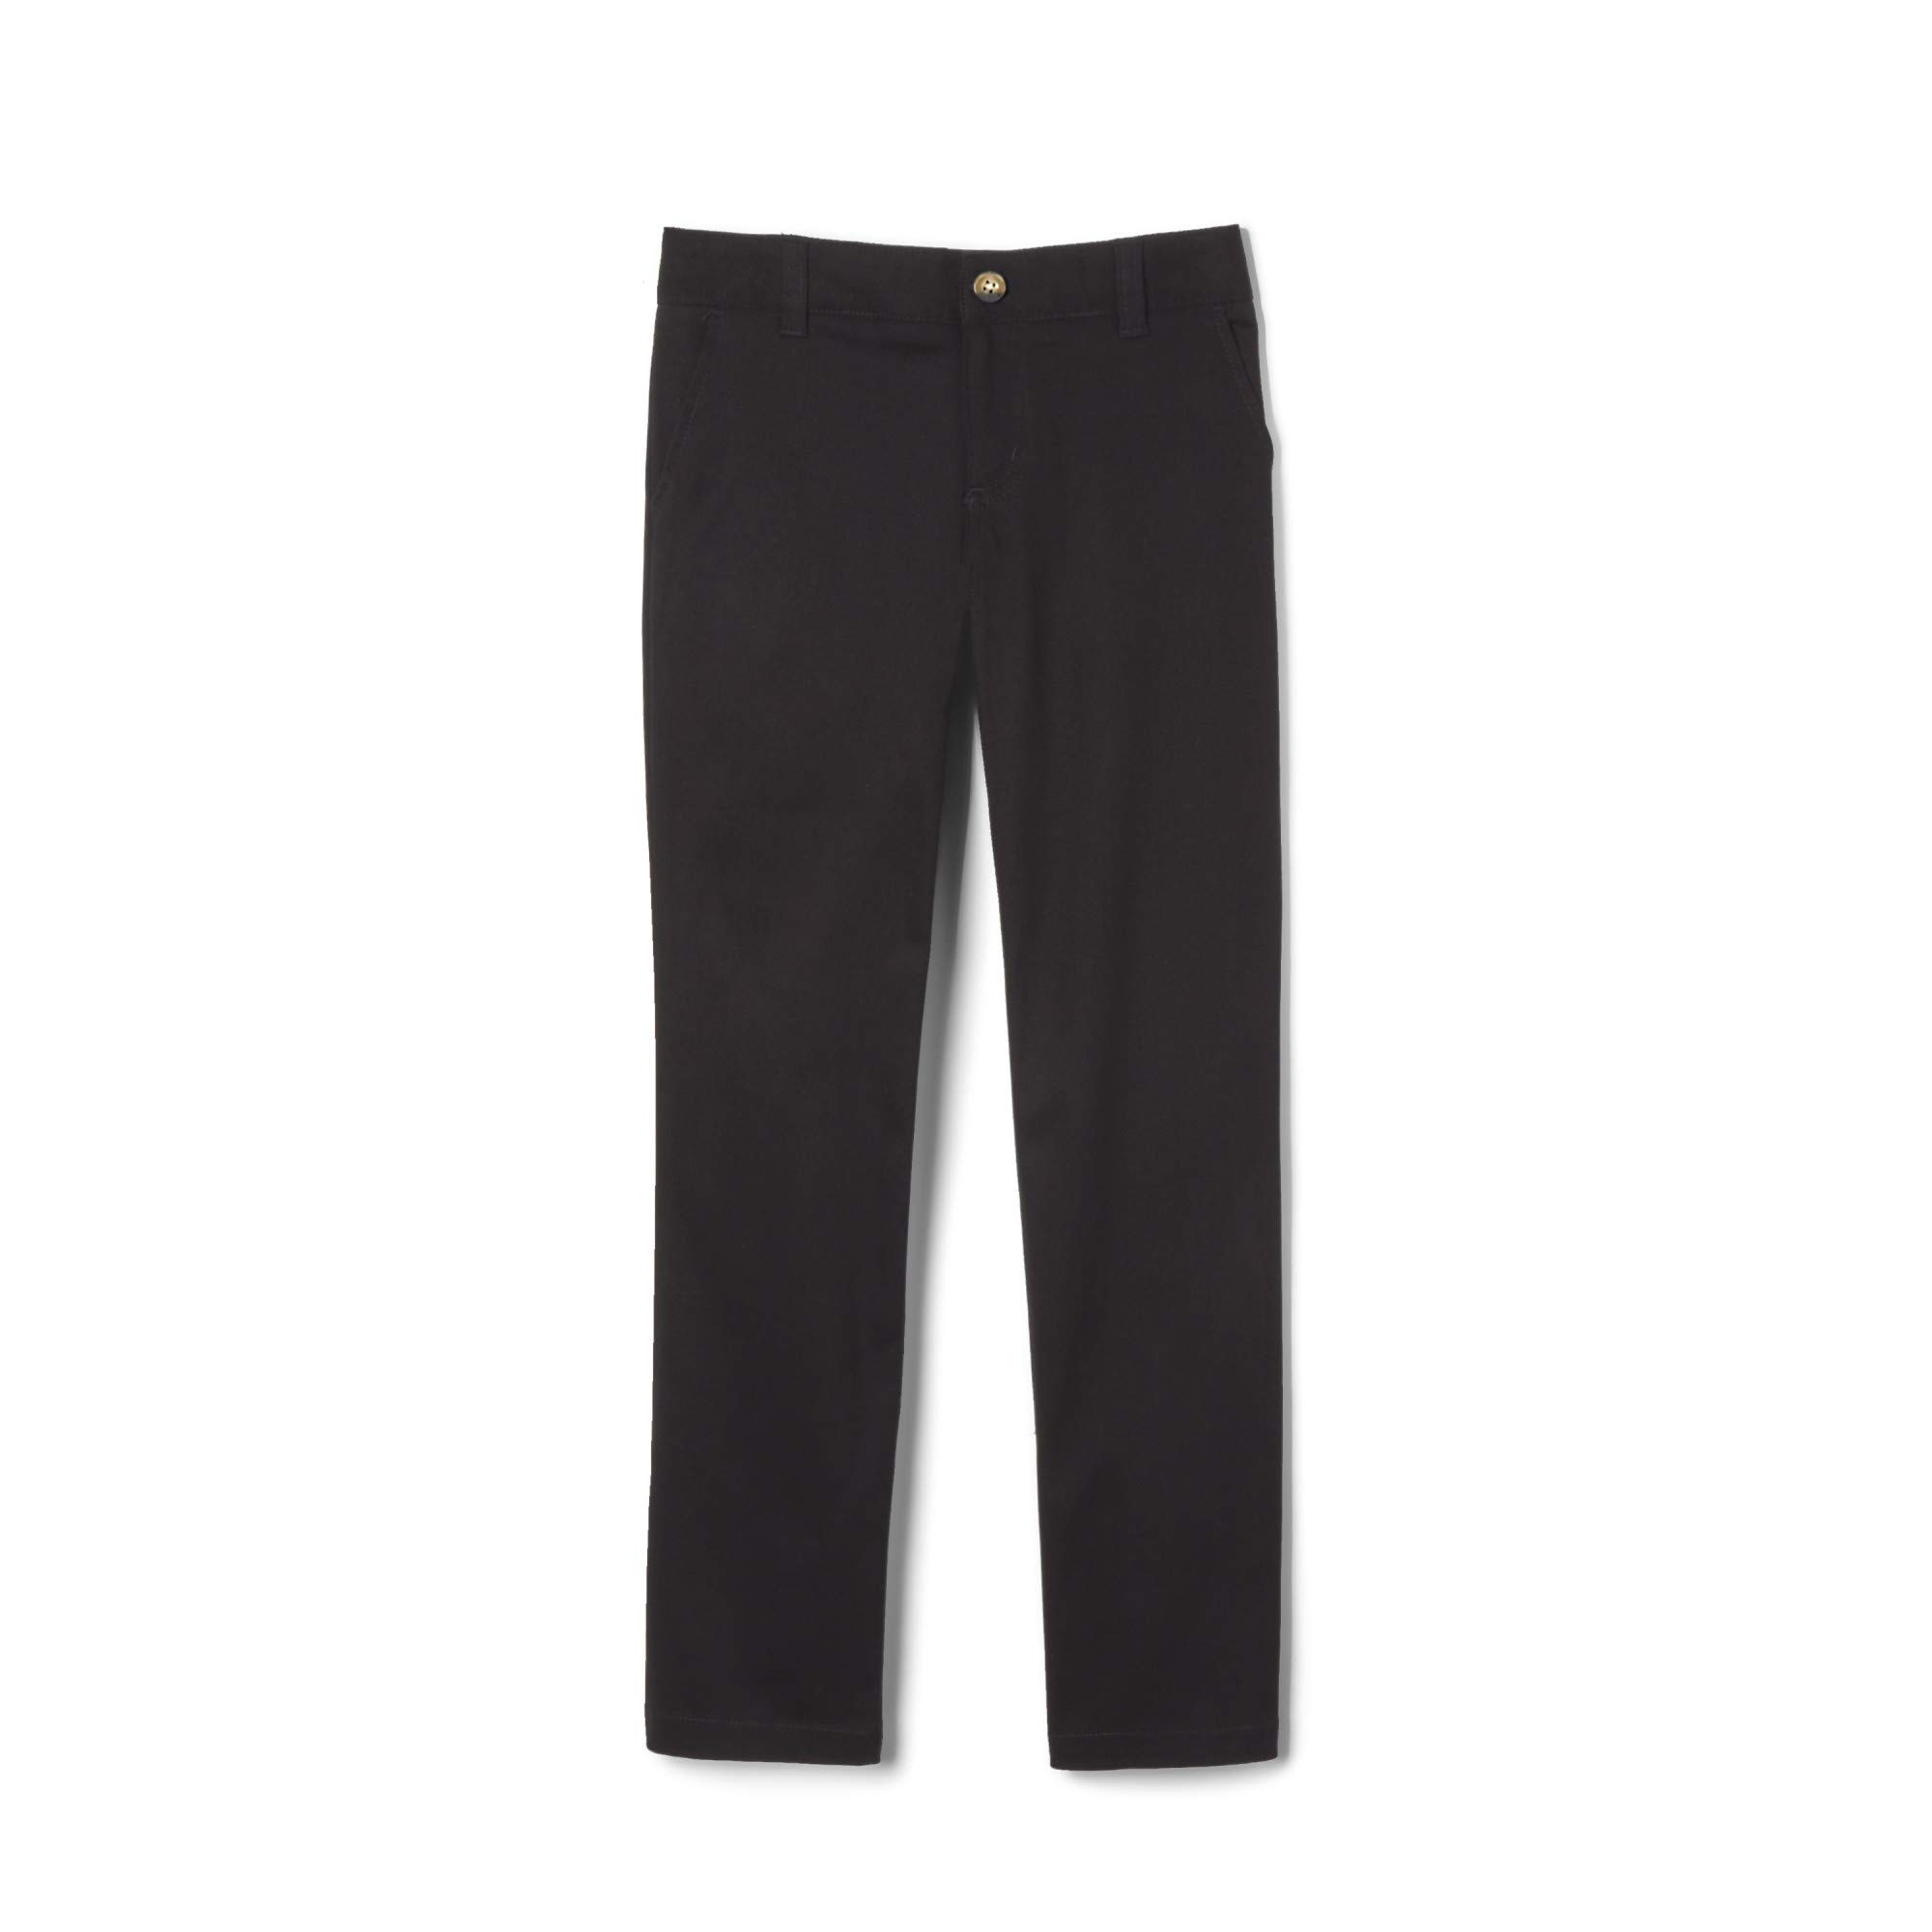 French Toast Little Girls' Straight Leg Pant, Black, 5